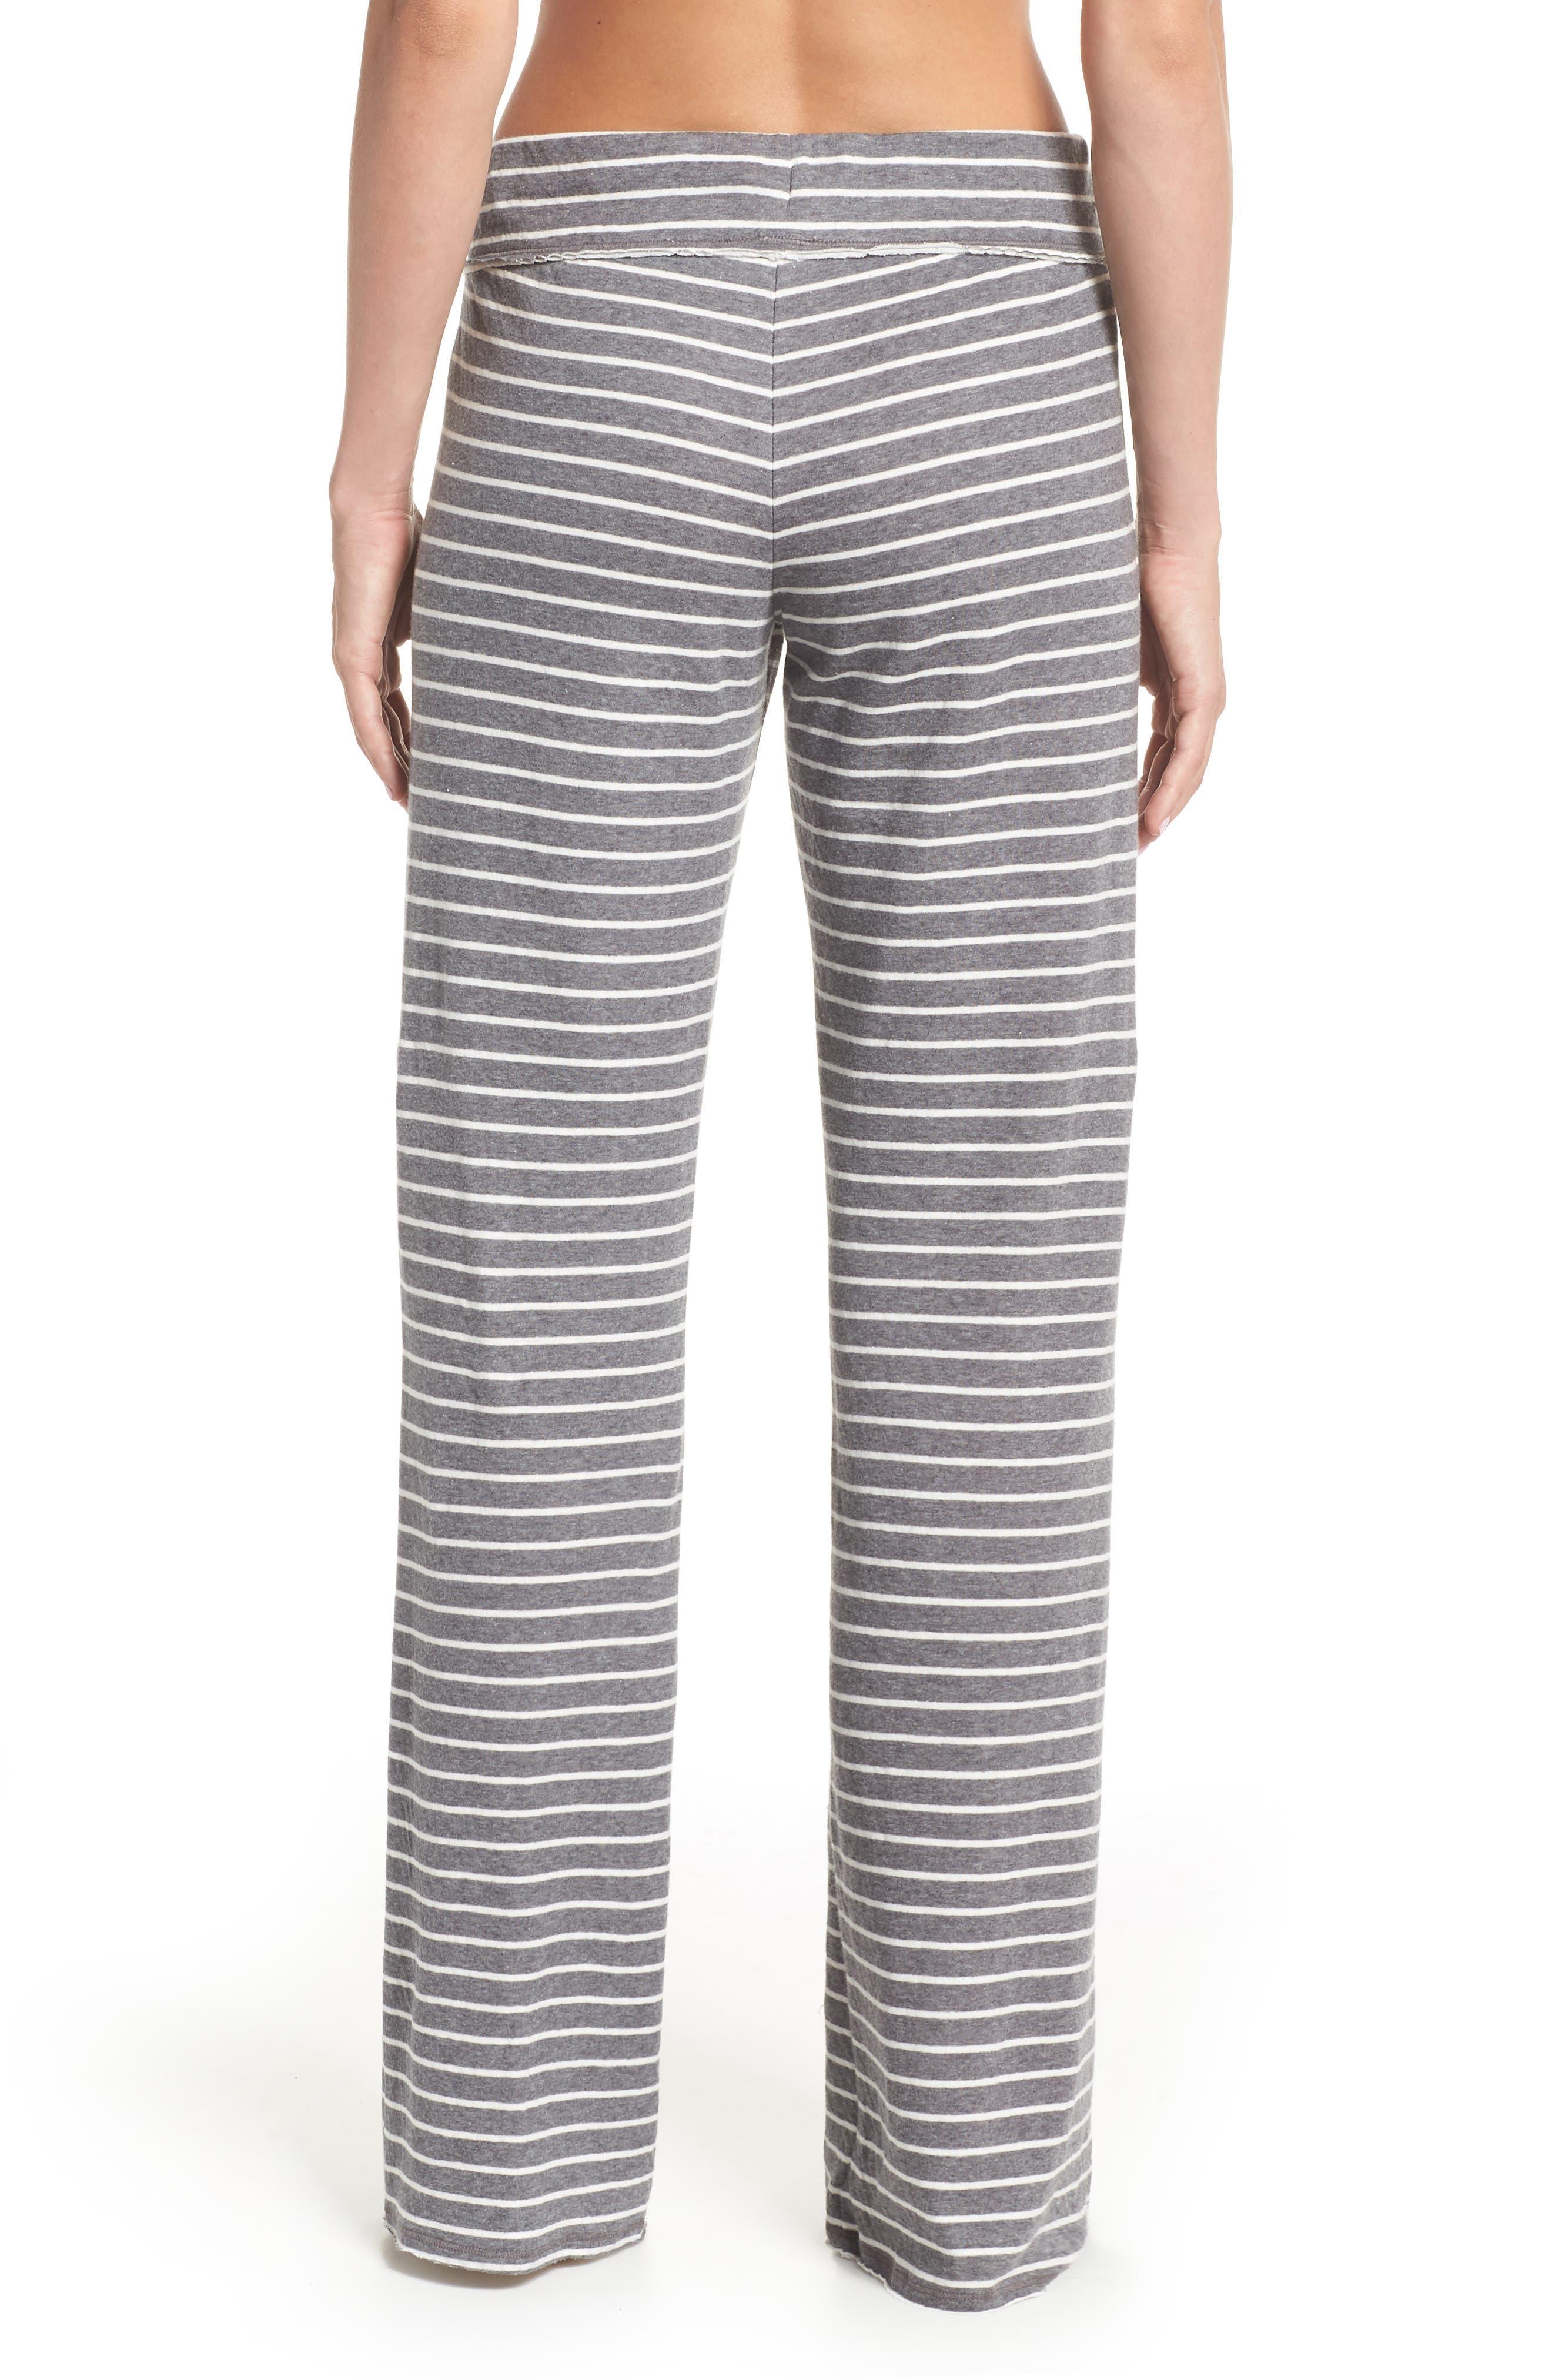 'Lazy Mornings' Lounge Pants,                             Alternate thumbnail 2, color,                             GREY PAVEMENT BELLA STRIPE